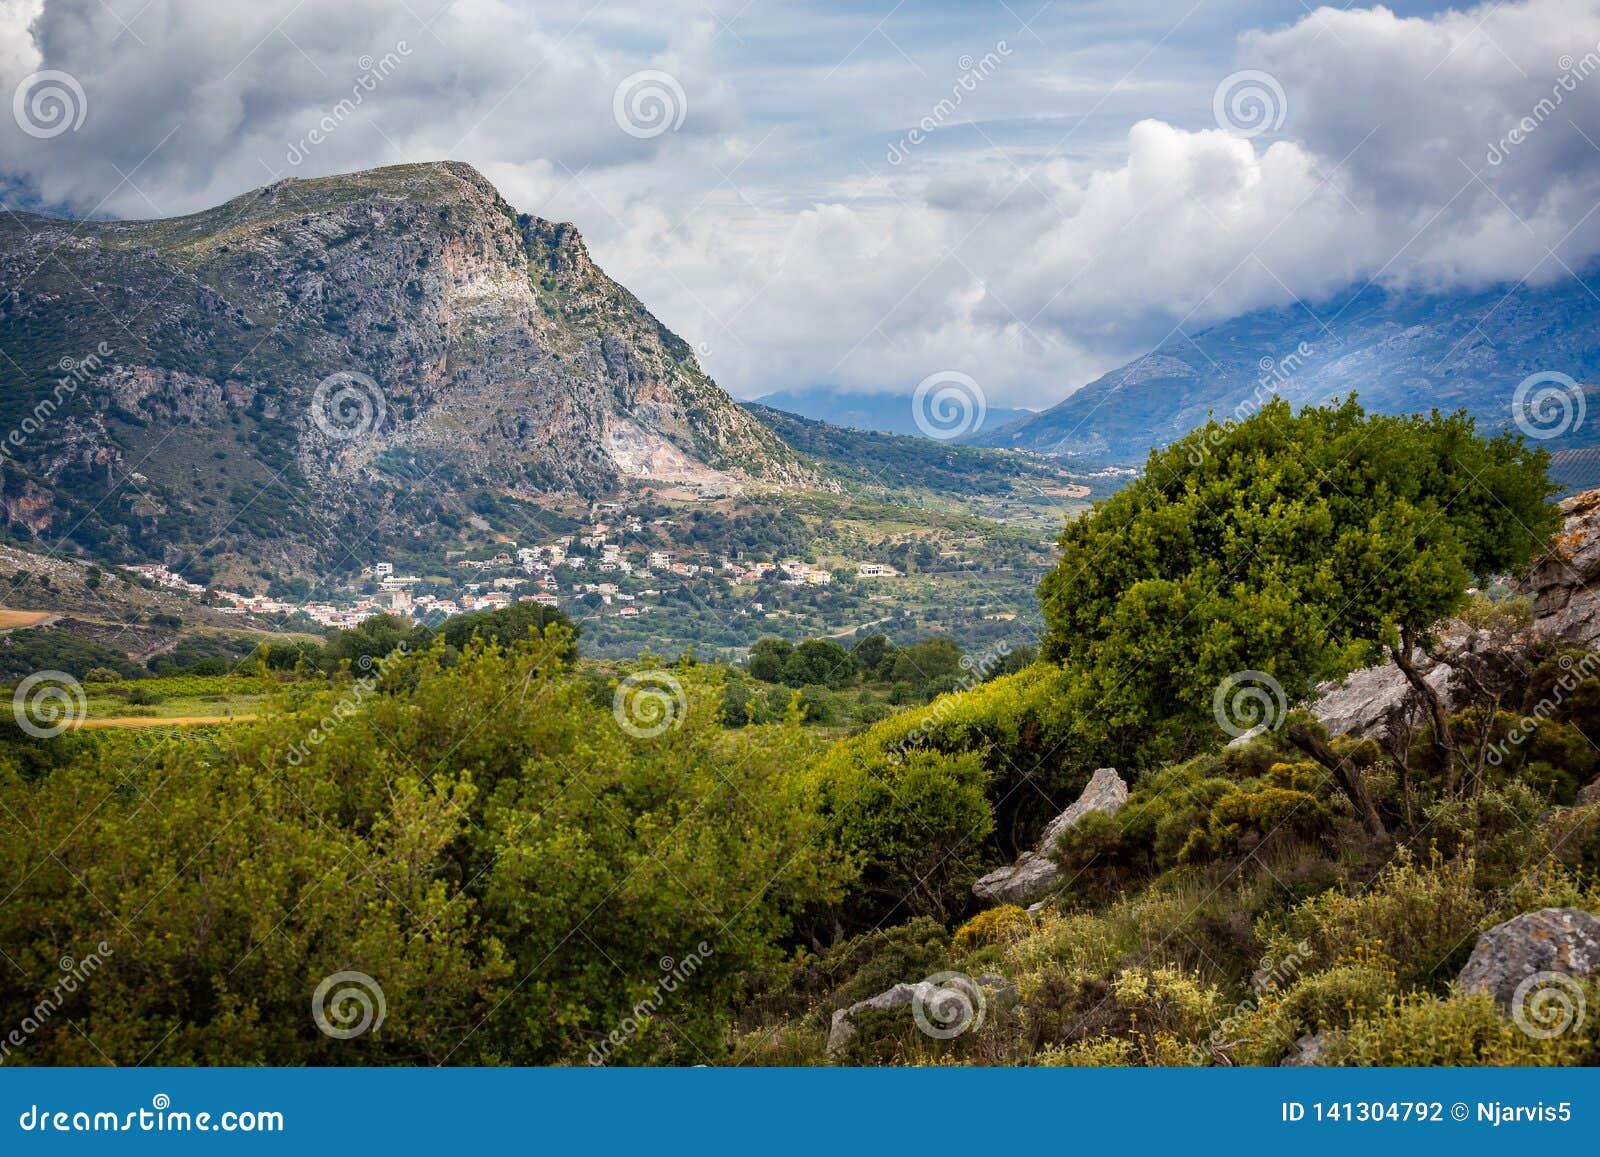 Paisaje montañoso de Creta interior, Grecia